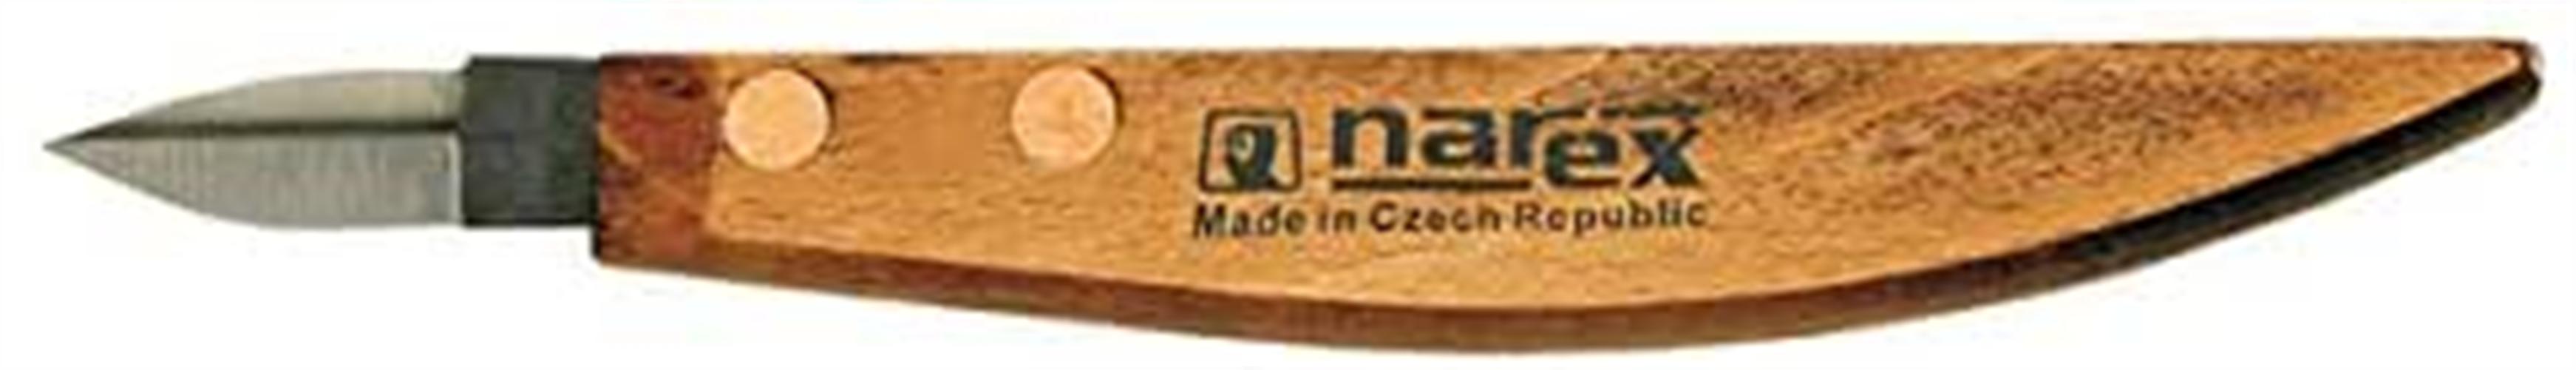 סכין גילוף-NAREX 822540